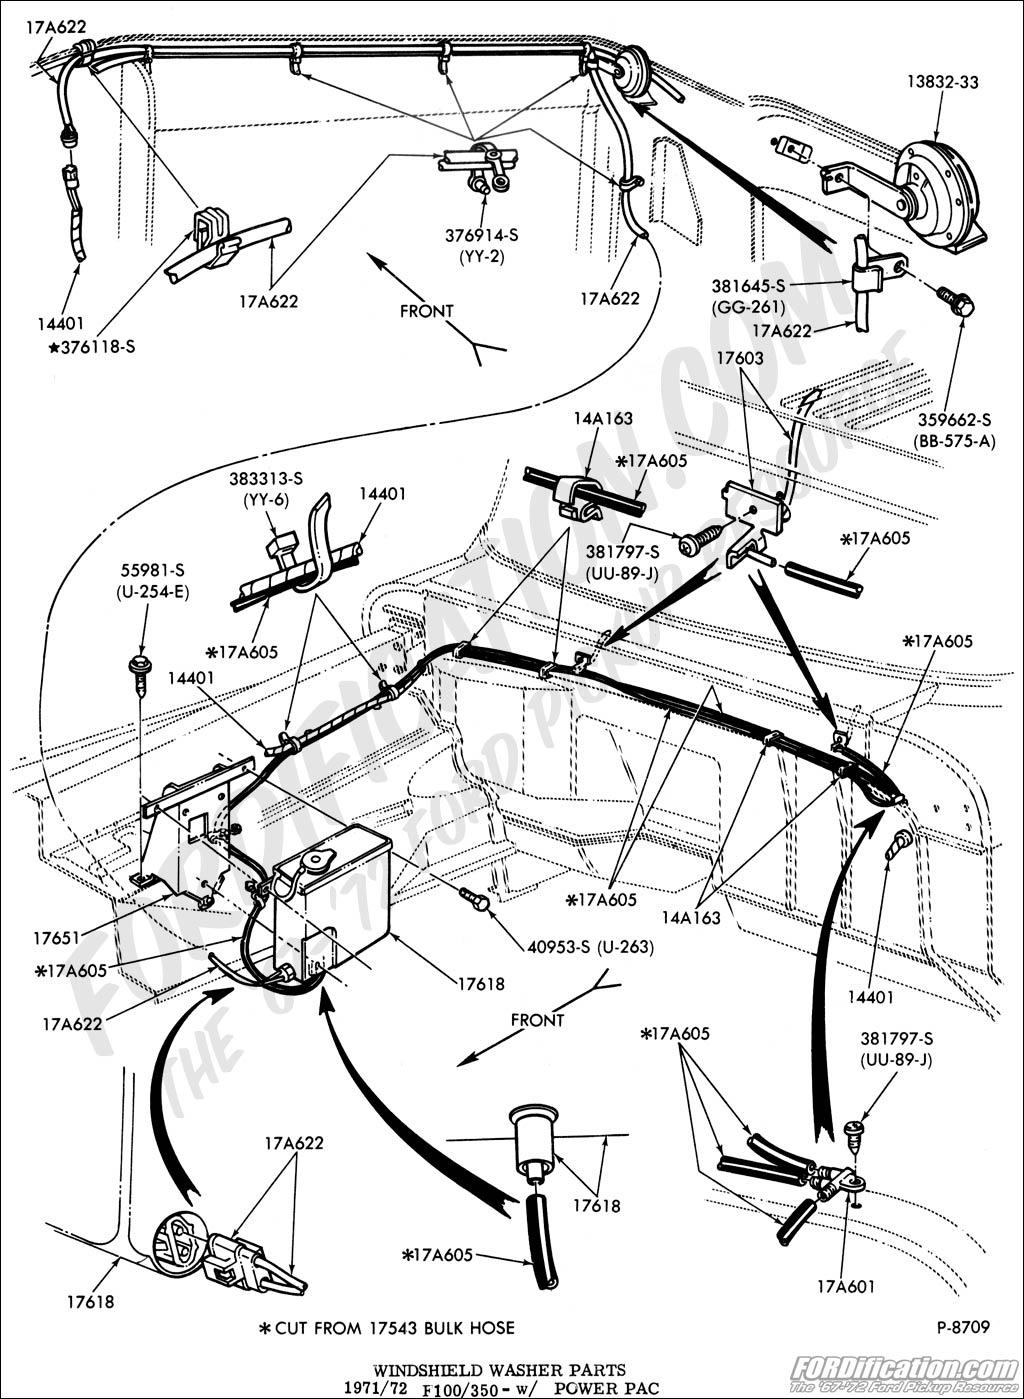 1997 honda accord window wiring 14 1997 honda accord interior 1997 honda accord window wiring